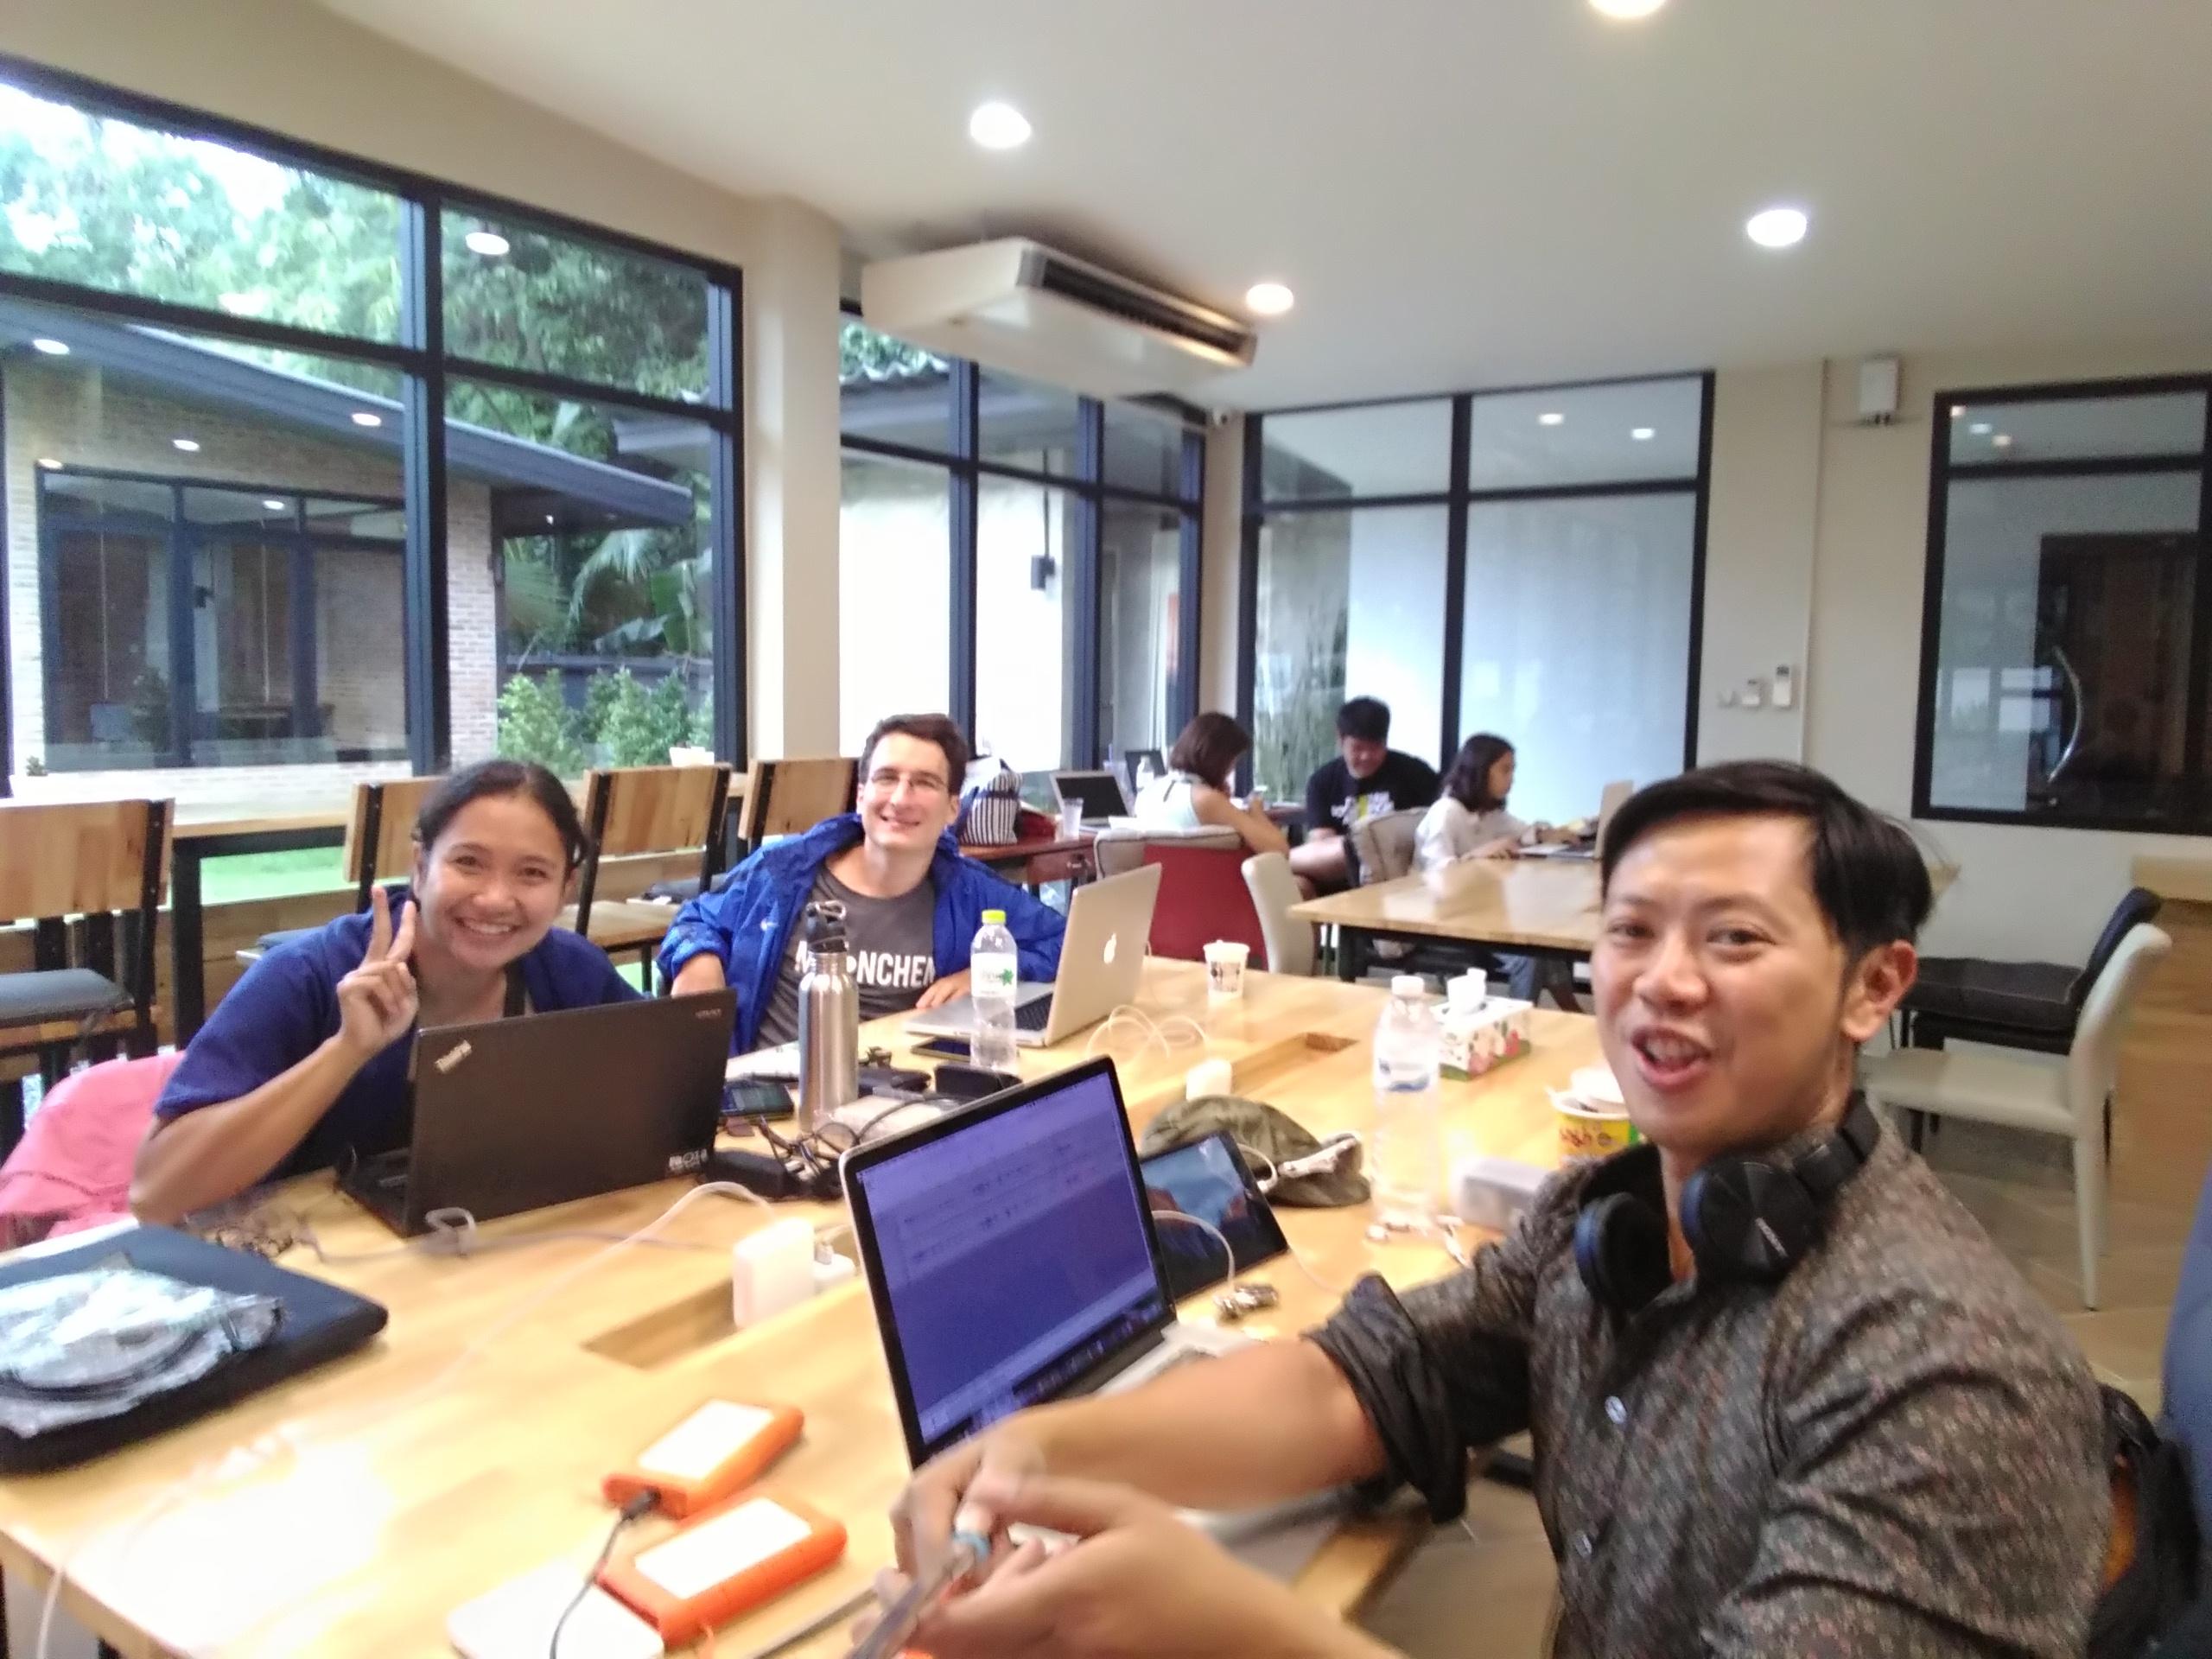 coworking in asia vs canada